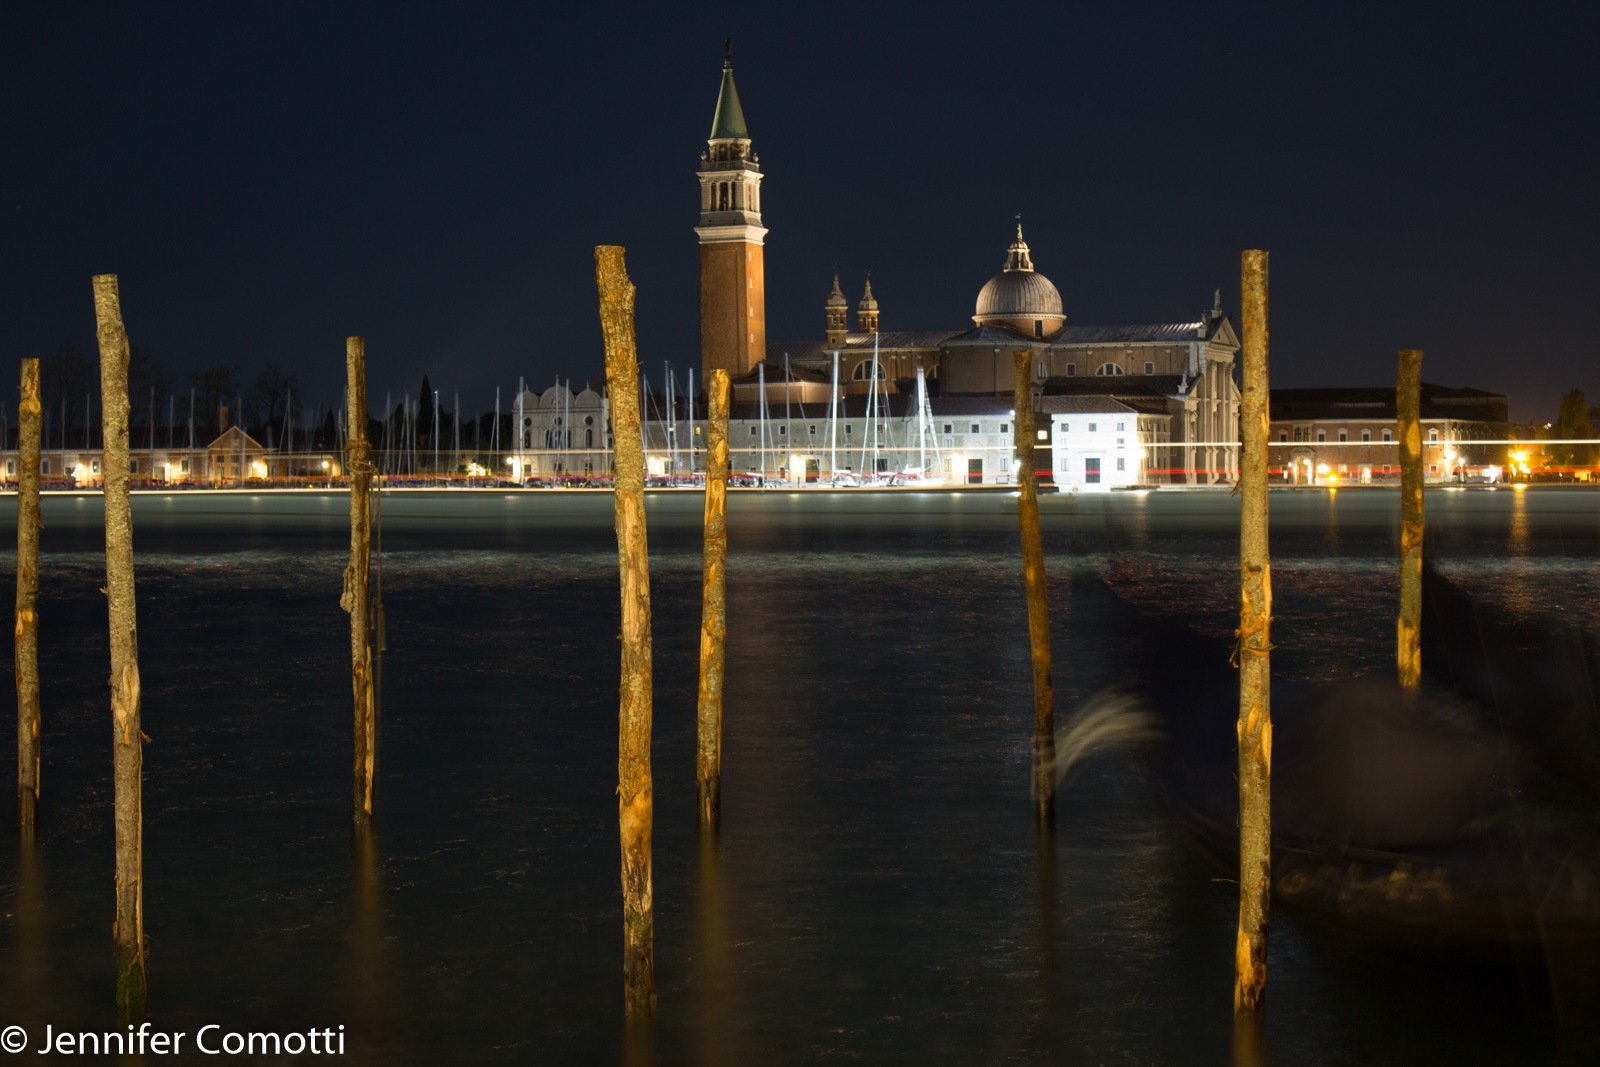 Night in Venice by comottijennifer